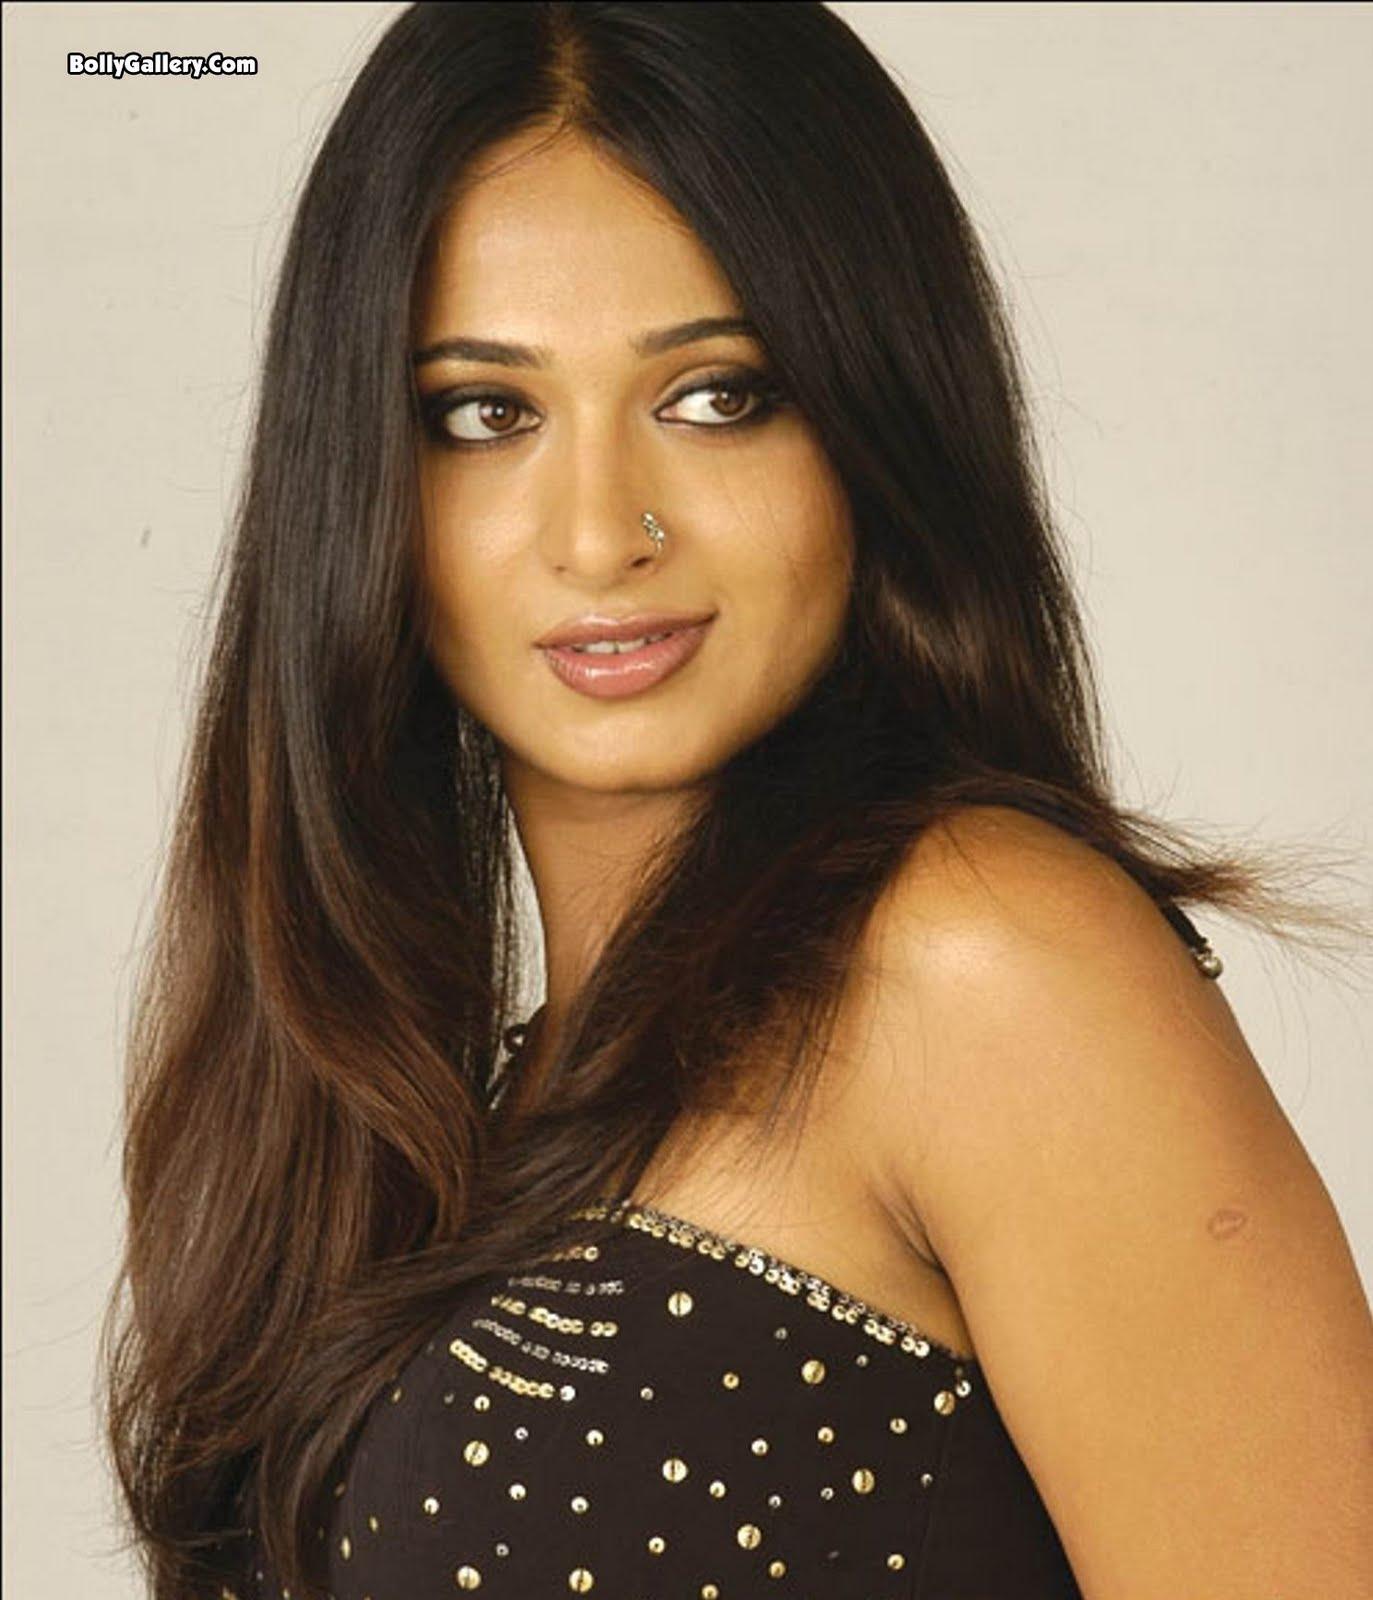 Bollywood celebrity's - Posts   Facebook